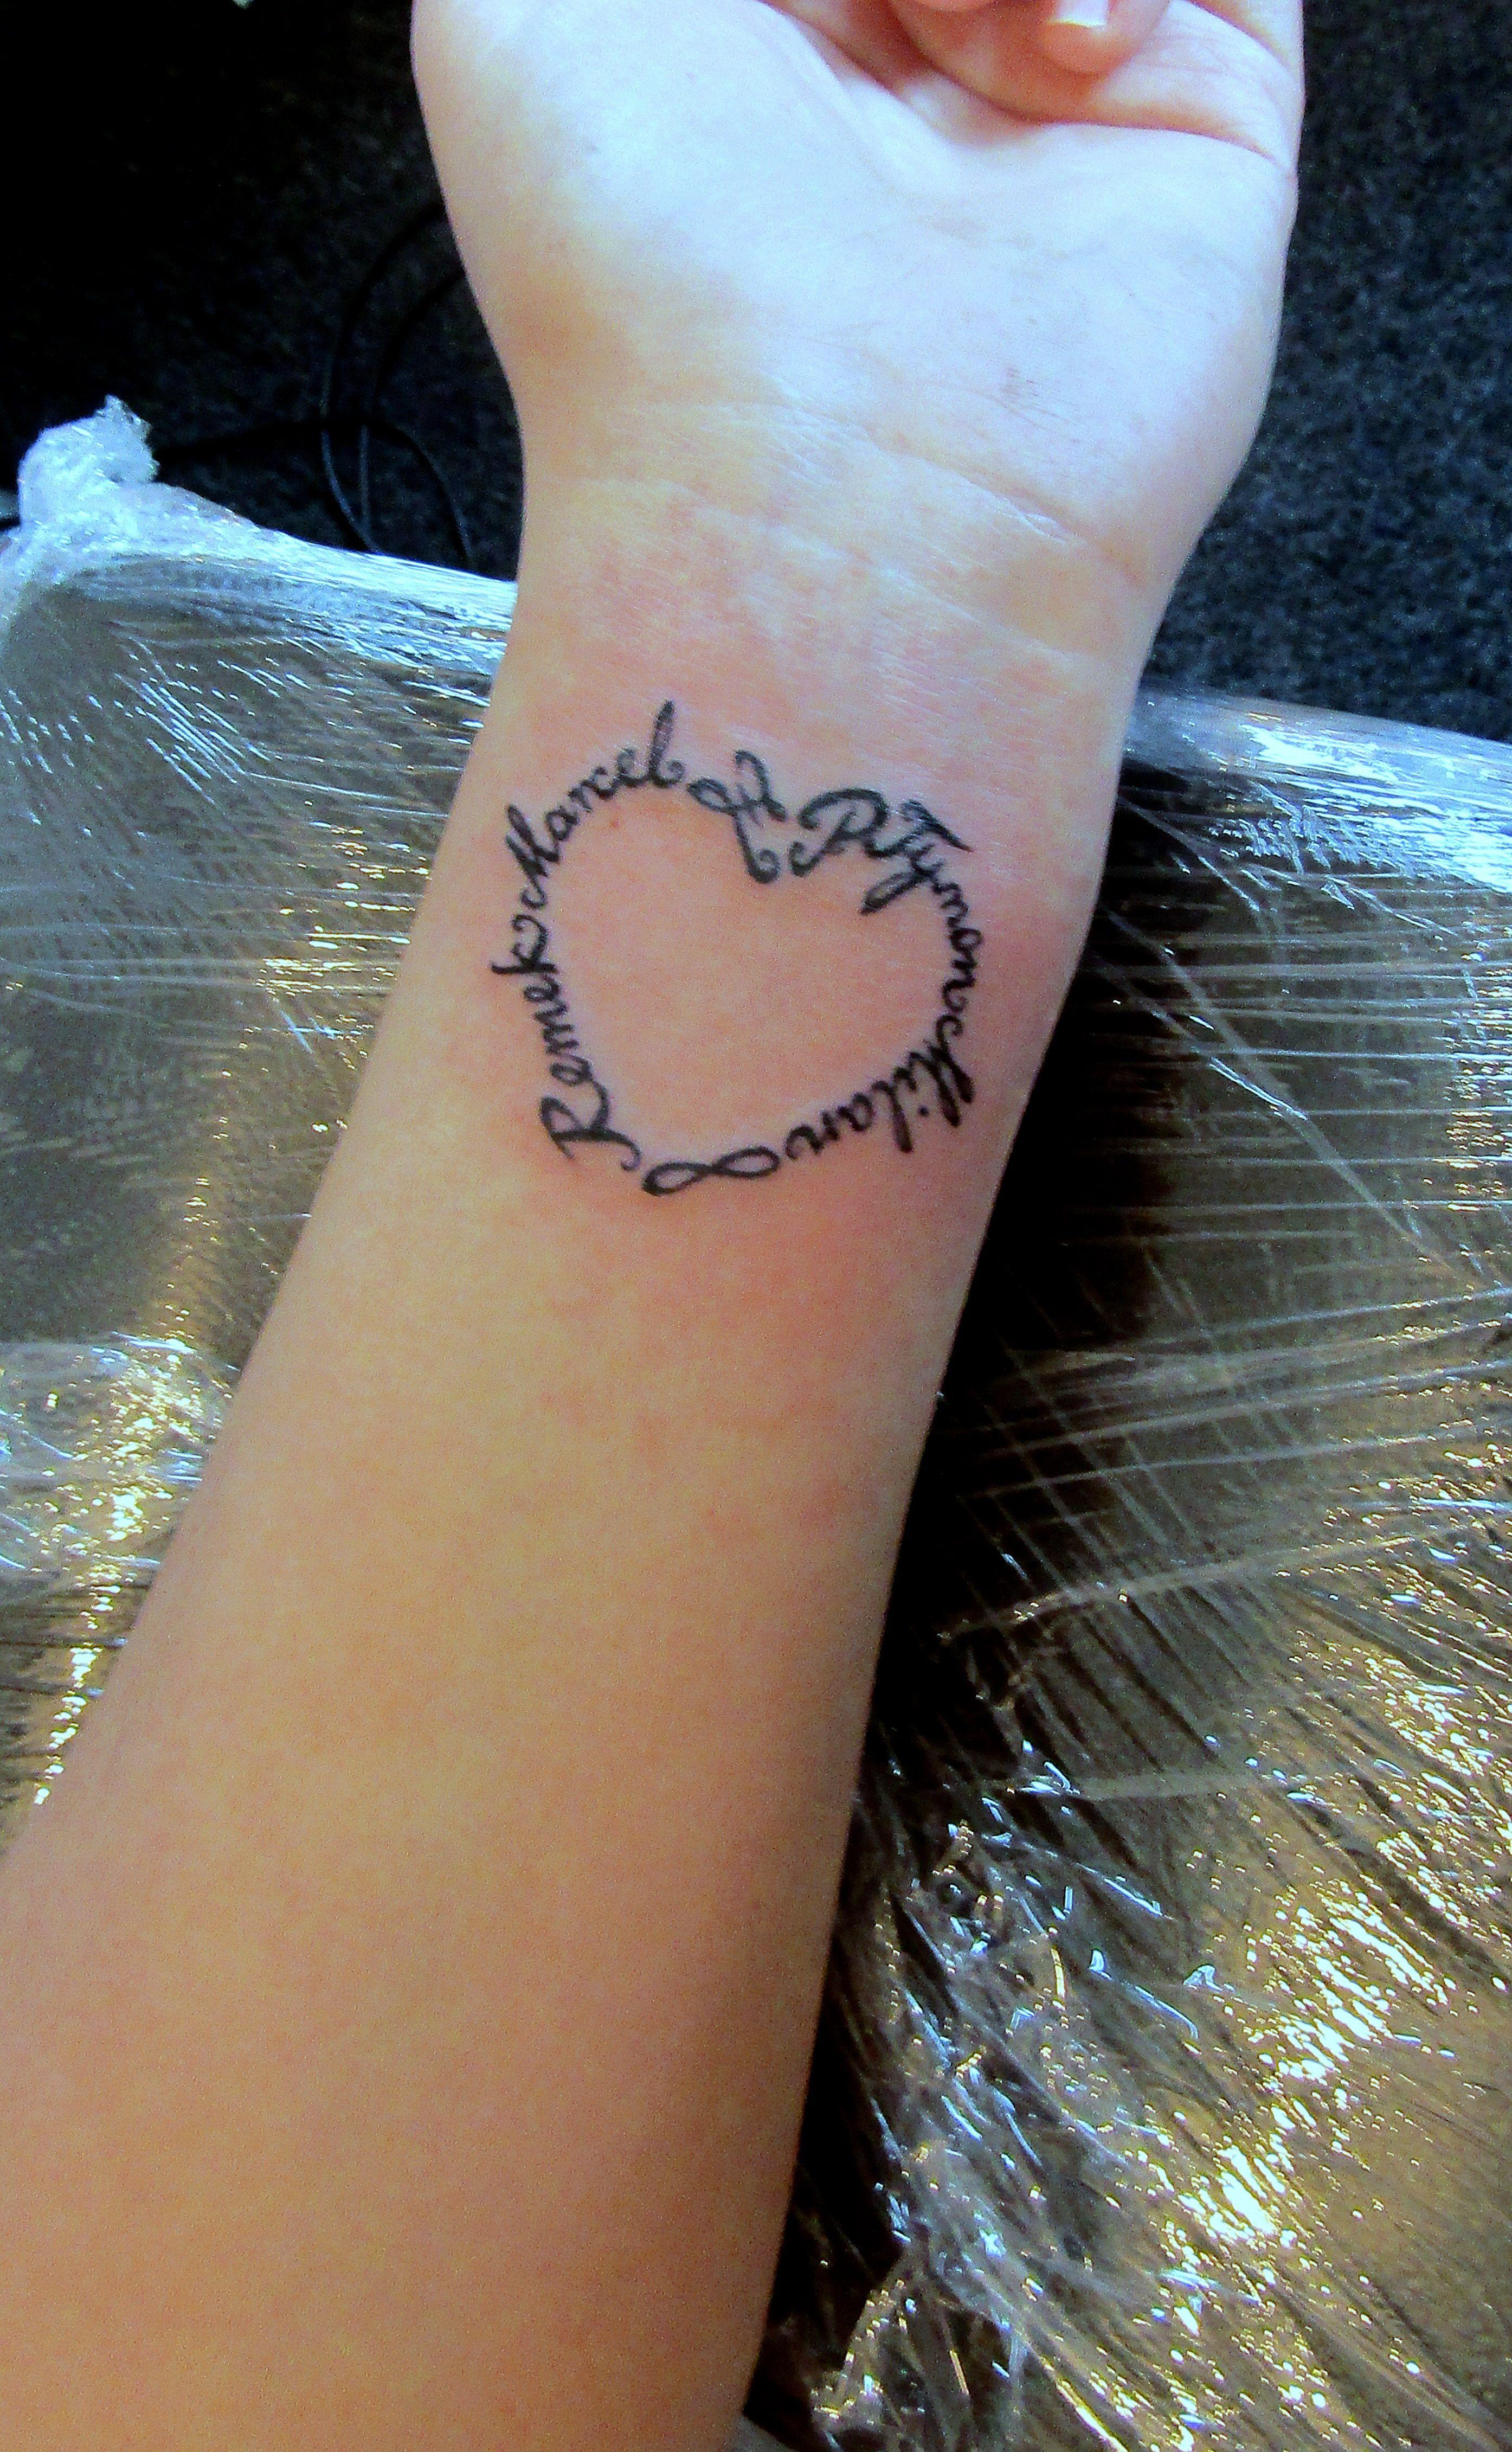 Children names tattoo tattoos pinterest tattoo for Tattoos for minors